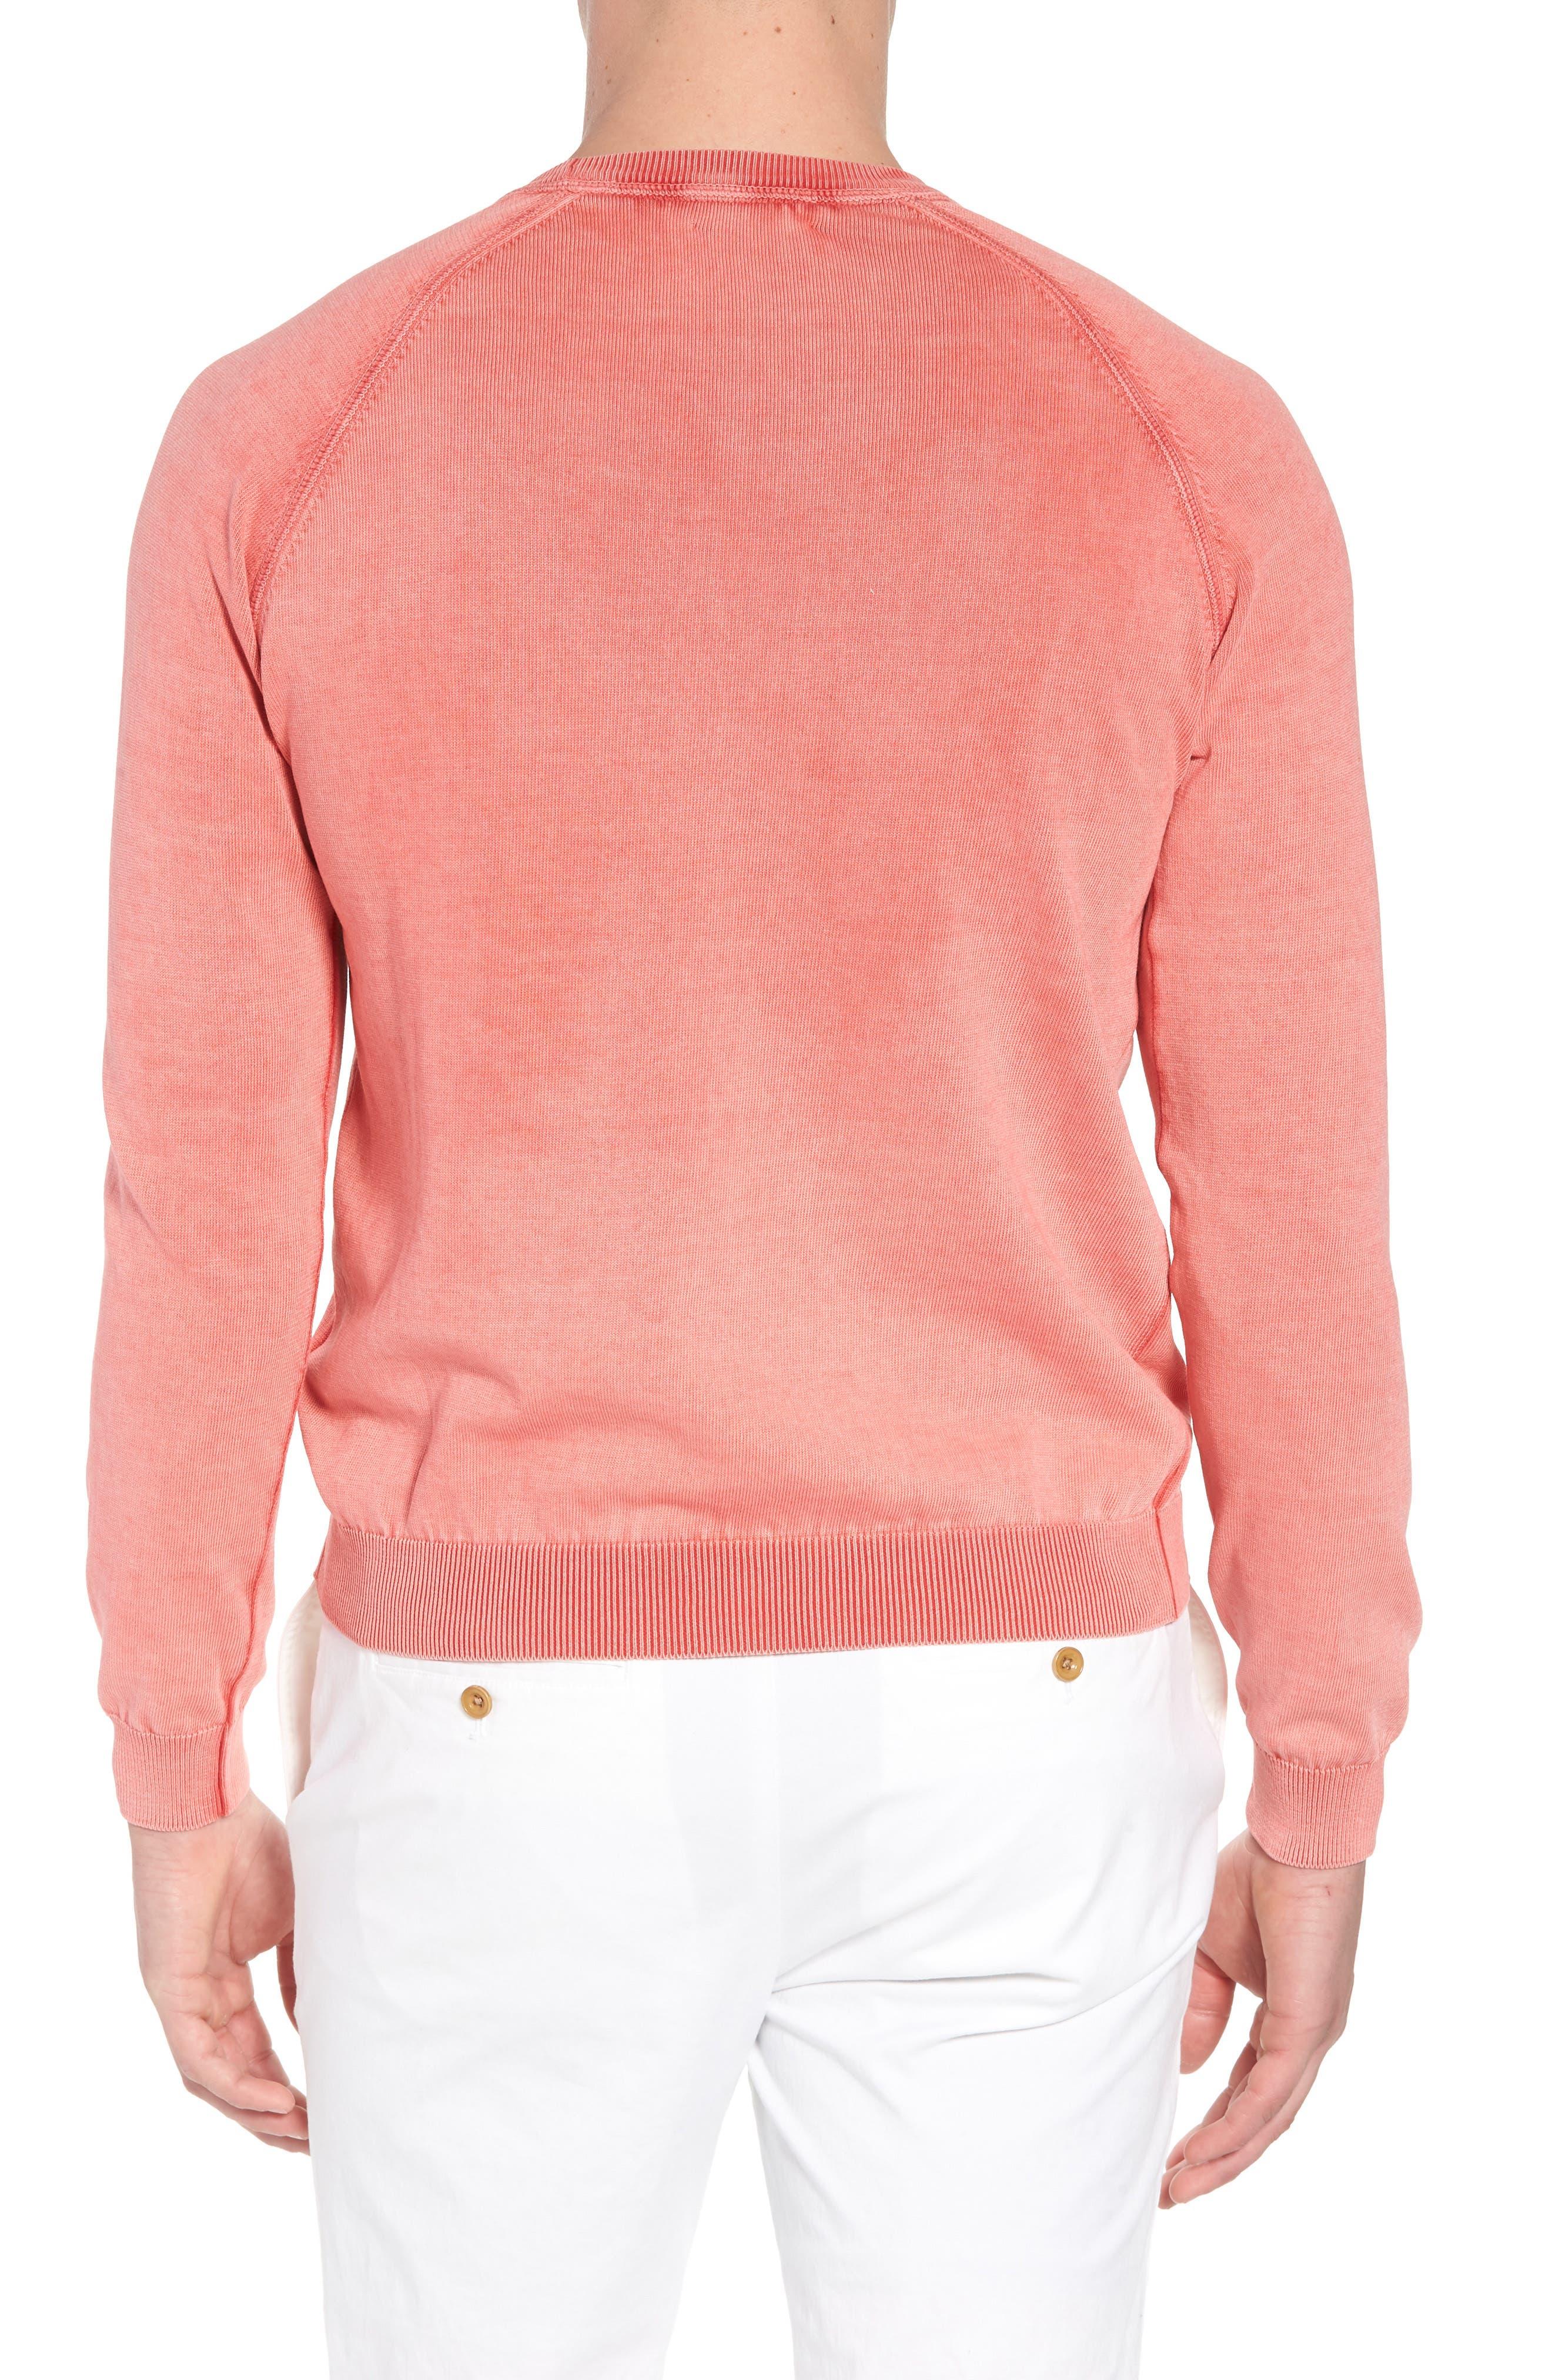 Stonewash Cotton Sweatshirt,                             Alternate thumbnail 2, color,                             842